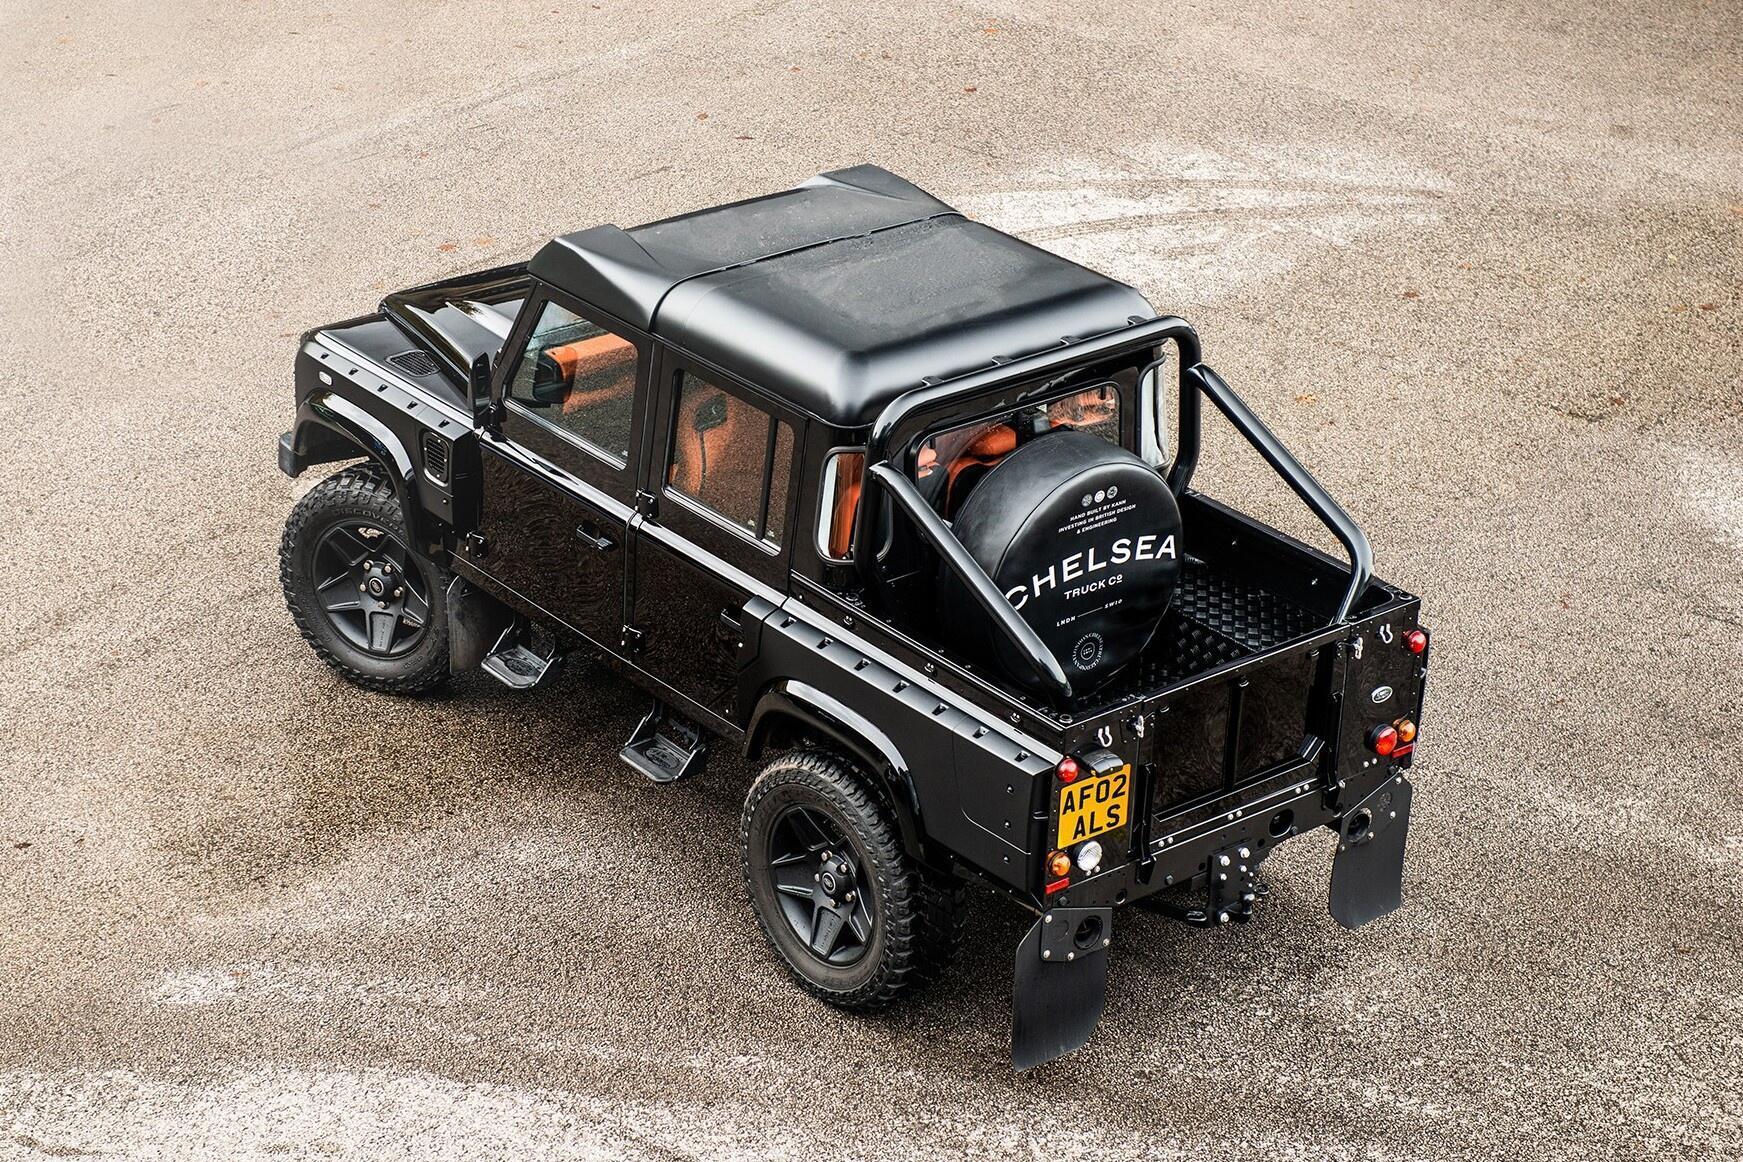 land-rover-defender-duoc-do-thanh-ban-tai